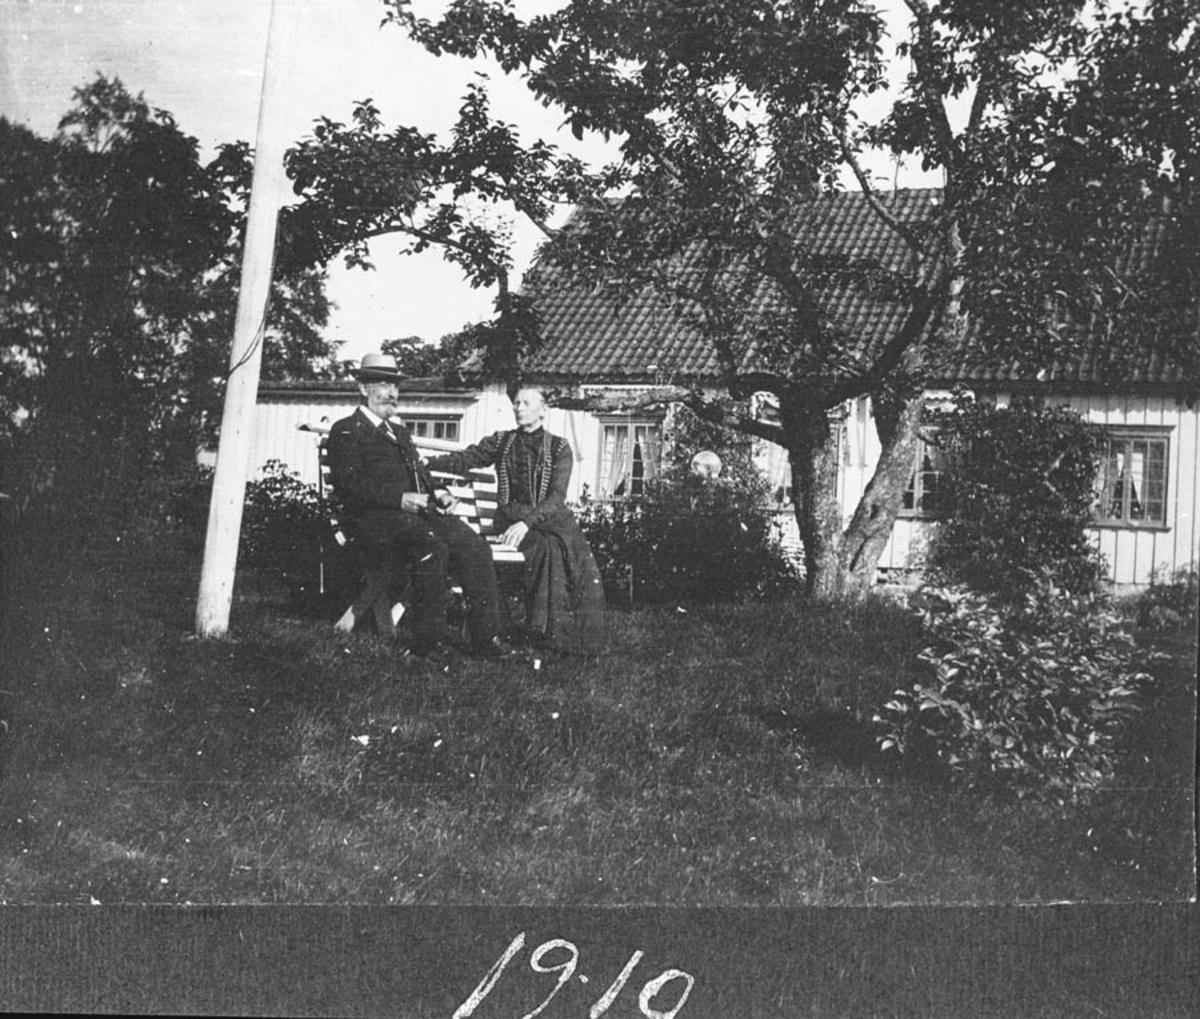 Eldre ektepar sittende på en benk i hagen.